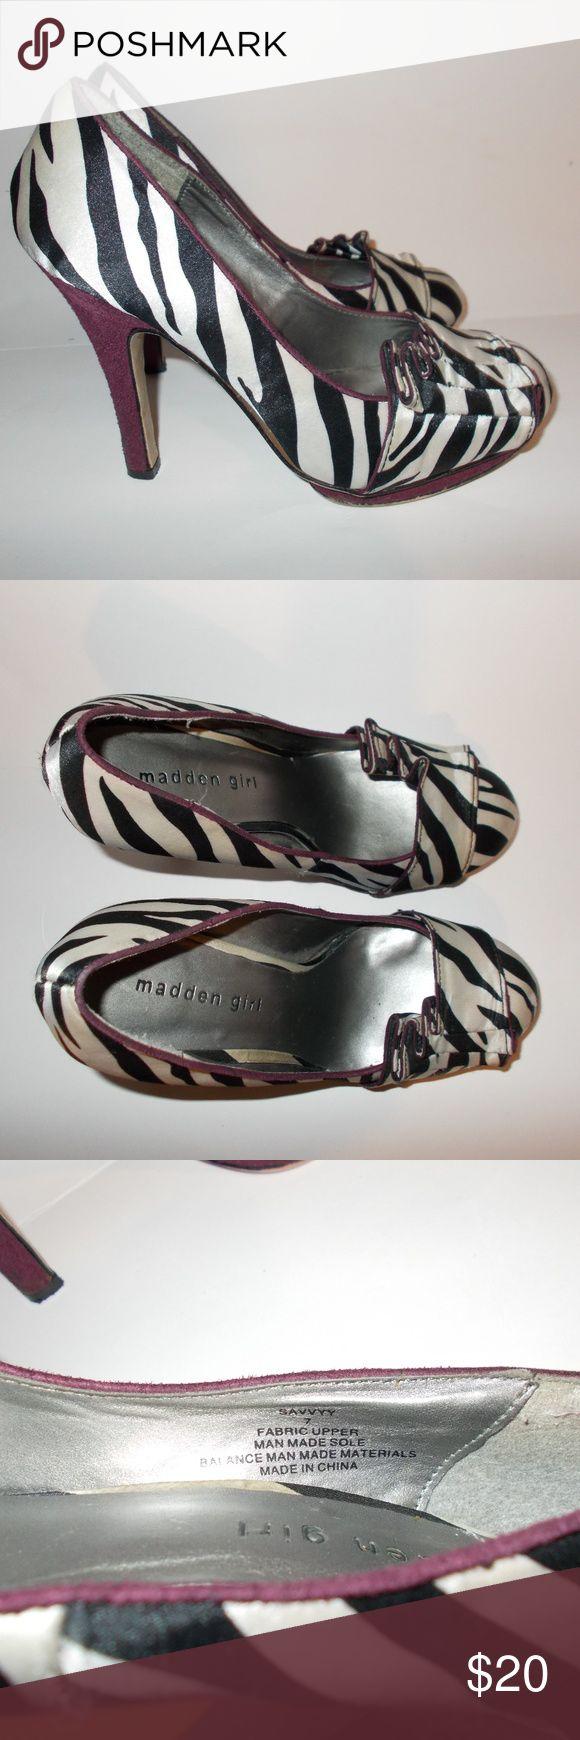 Madden Girl zebra heels 7 pumps purple Madden Girl zebra heels 7 pumps purple Madden Girl Shoes Heels